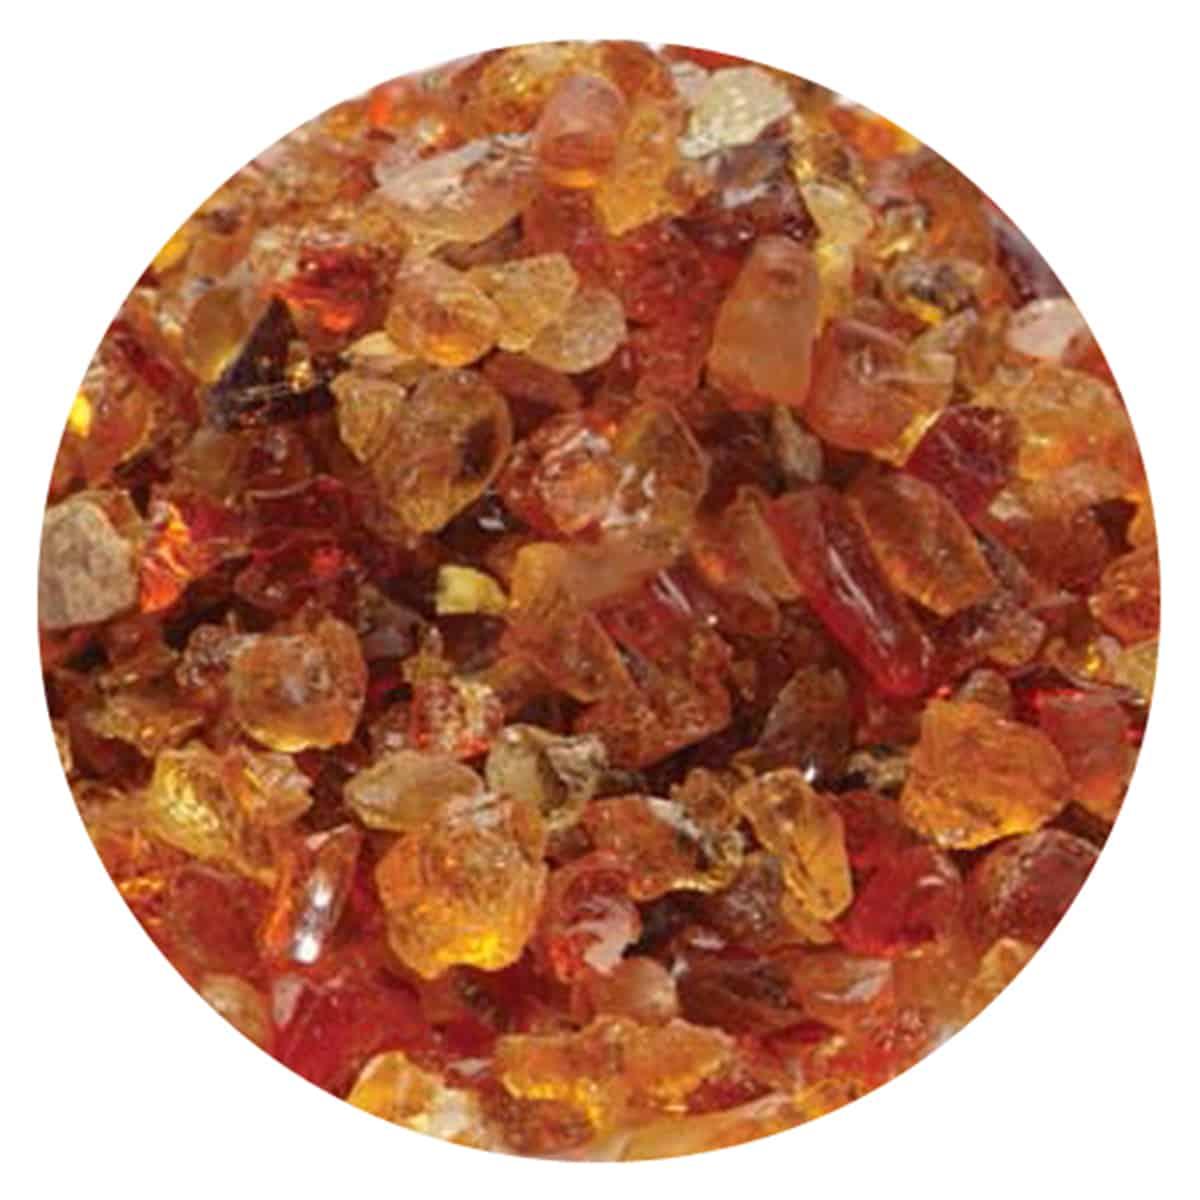 Buy IAG Foods Gum Arabic (Acacia Gum or Kamarkas) - 1 kg